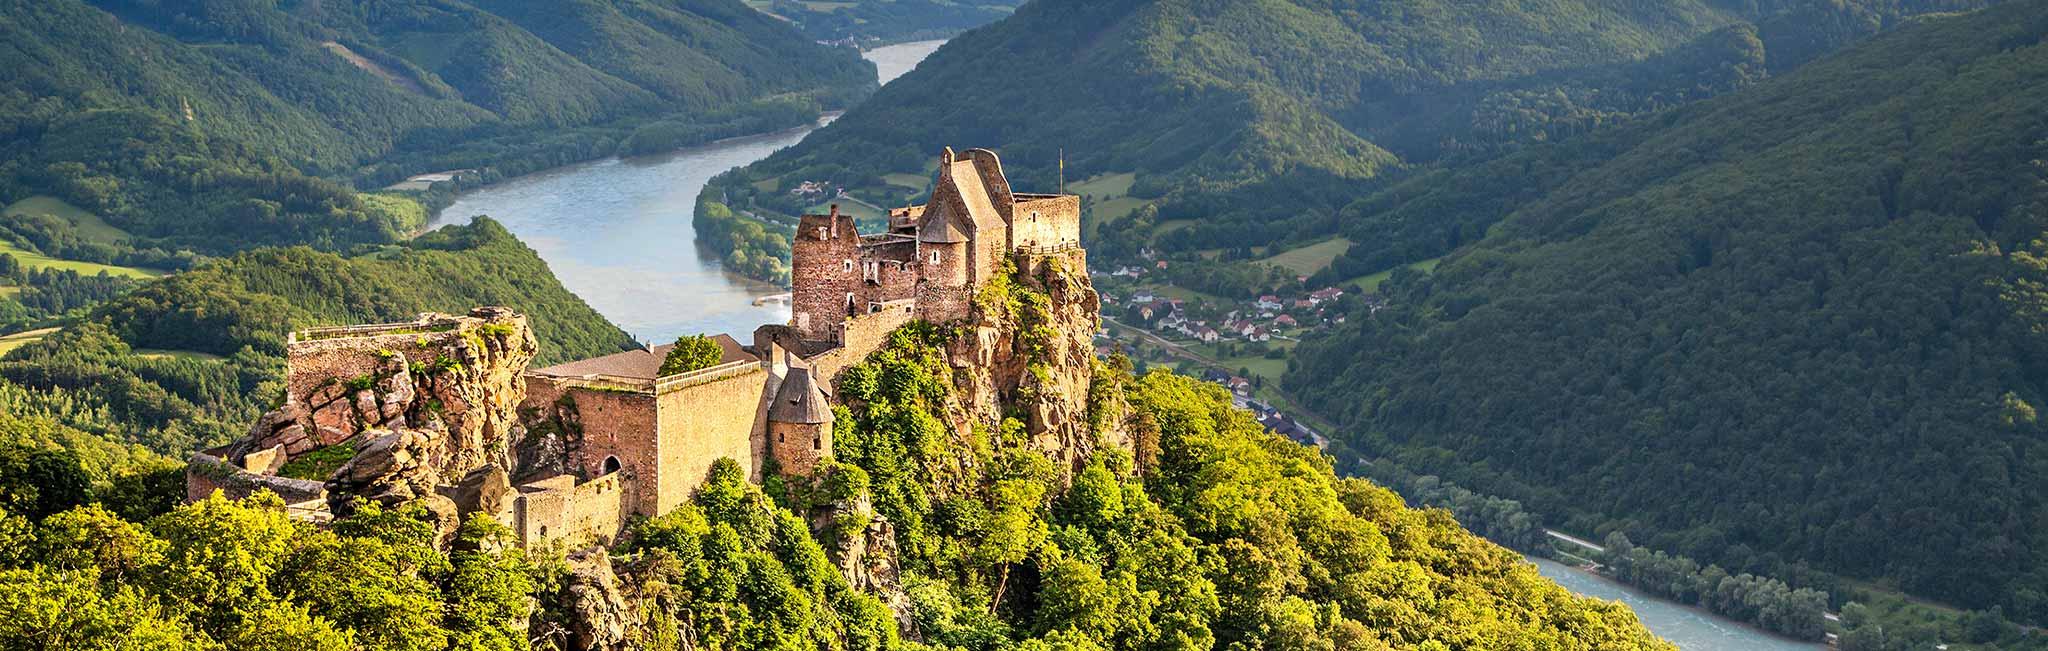 Austria Tours - Wachau danube river Aggstein Castle